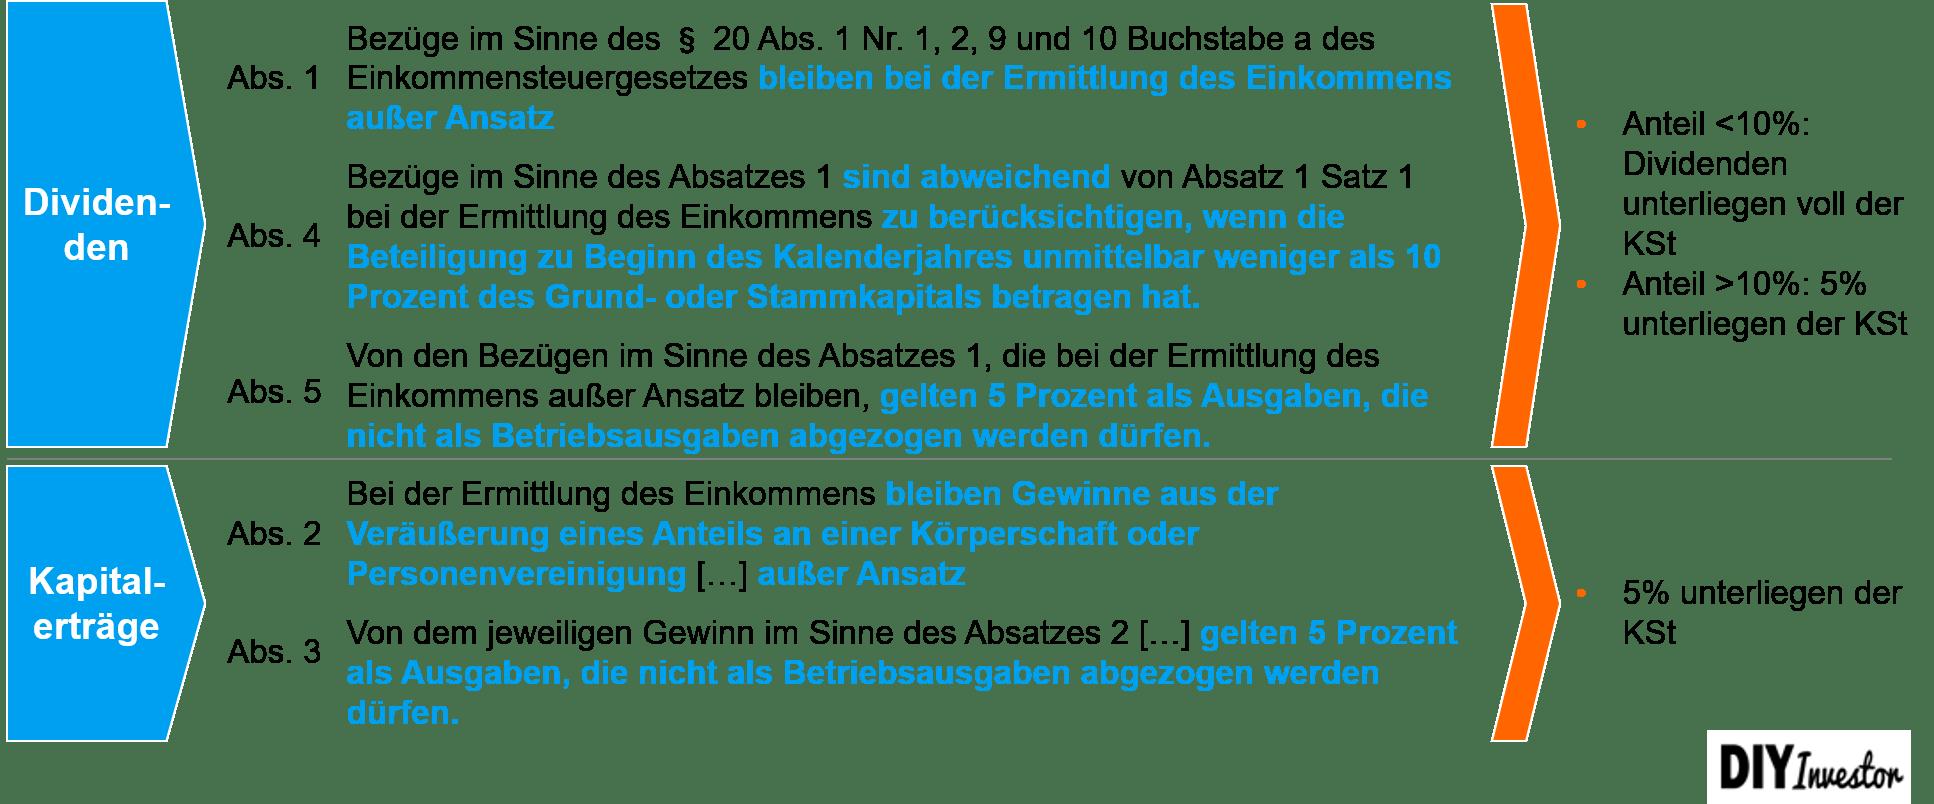 Vermögensverwaltende GmbH - Backup Körperschaftssteuer §8b KStG